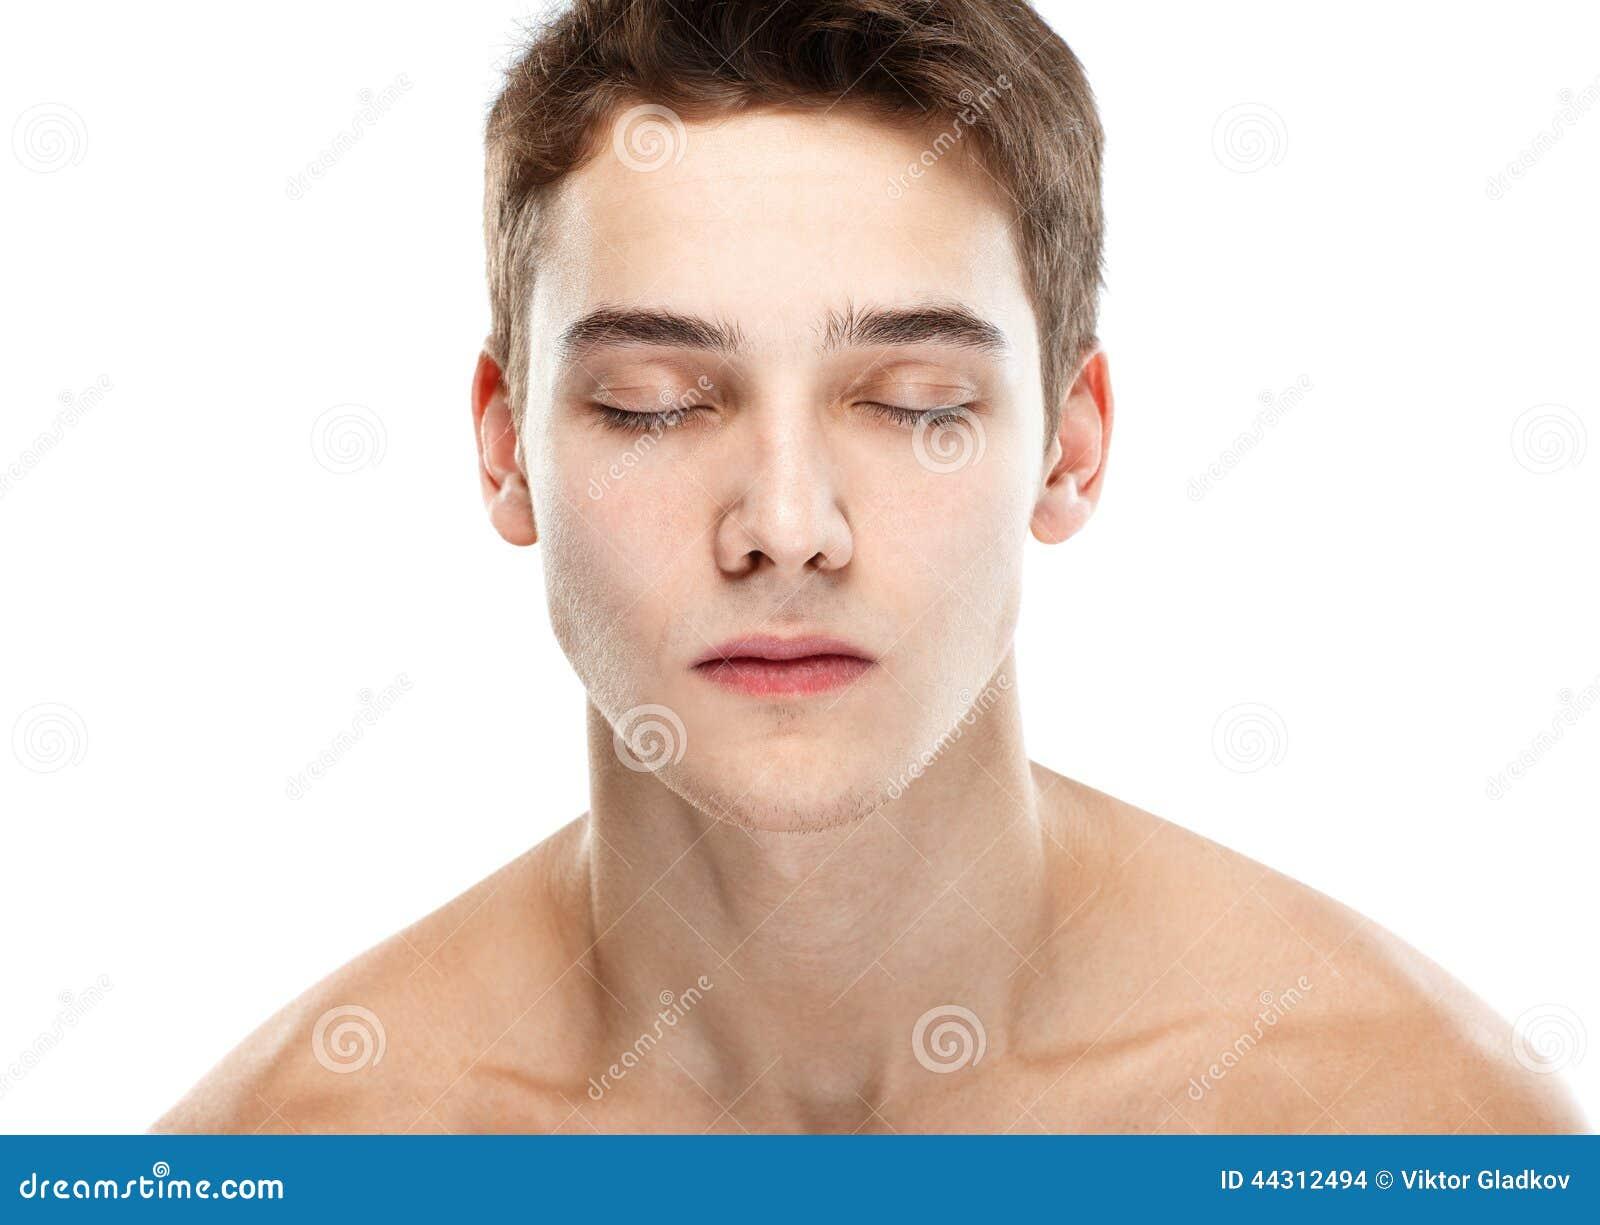 homo piksutter sperm i munden